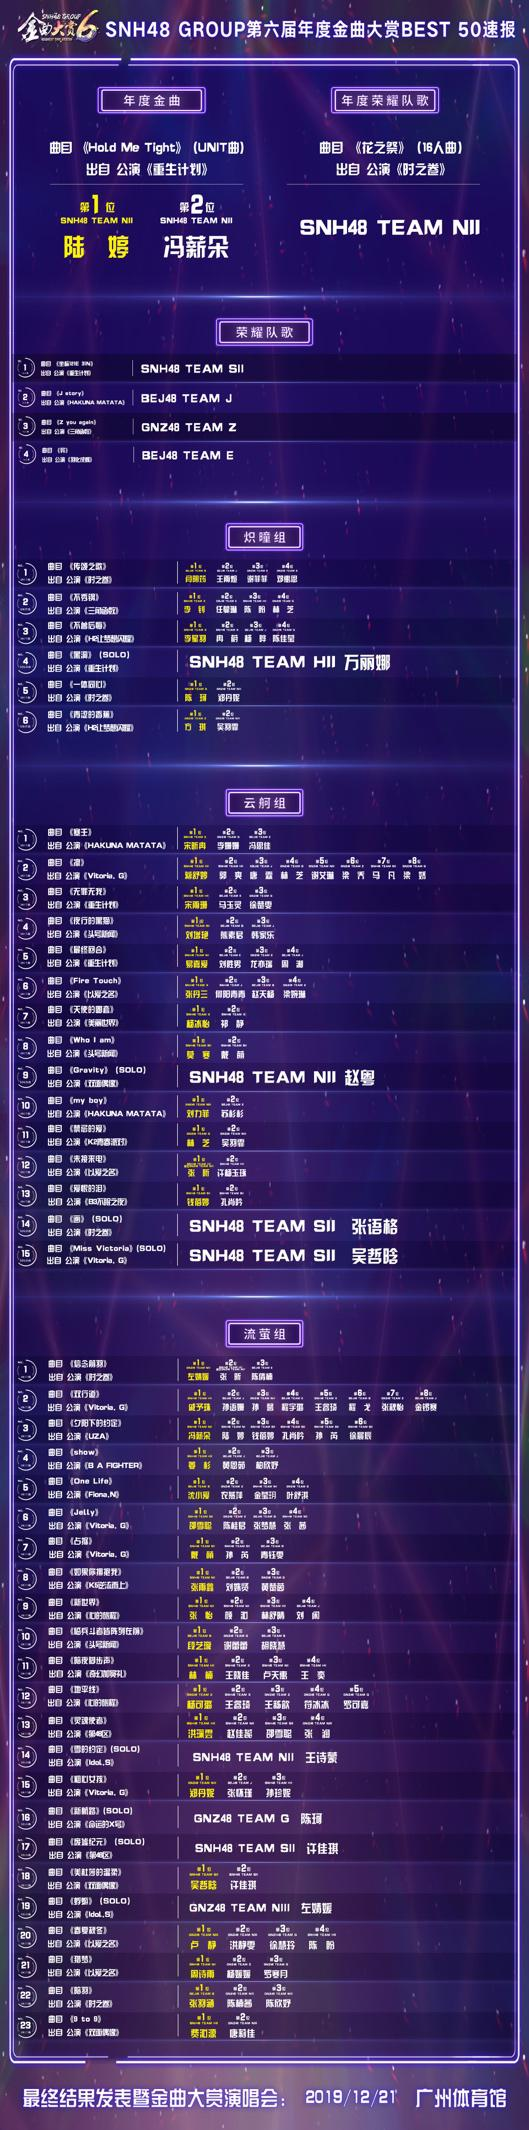 SNH48GROUP年度金曲大赏BEST50速报揭晓,《HoldMeTight》、《花之祭》暂获年度金曲及年度荣耀队歌!